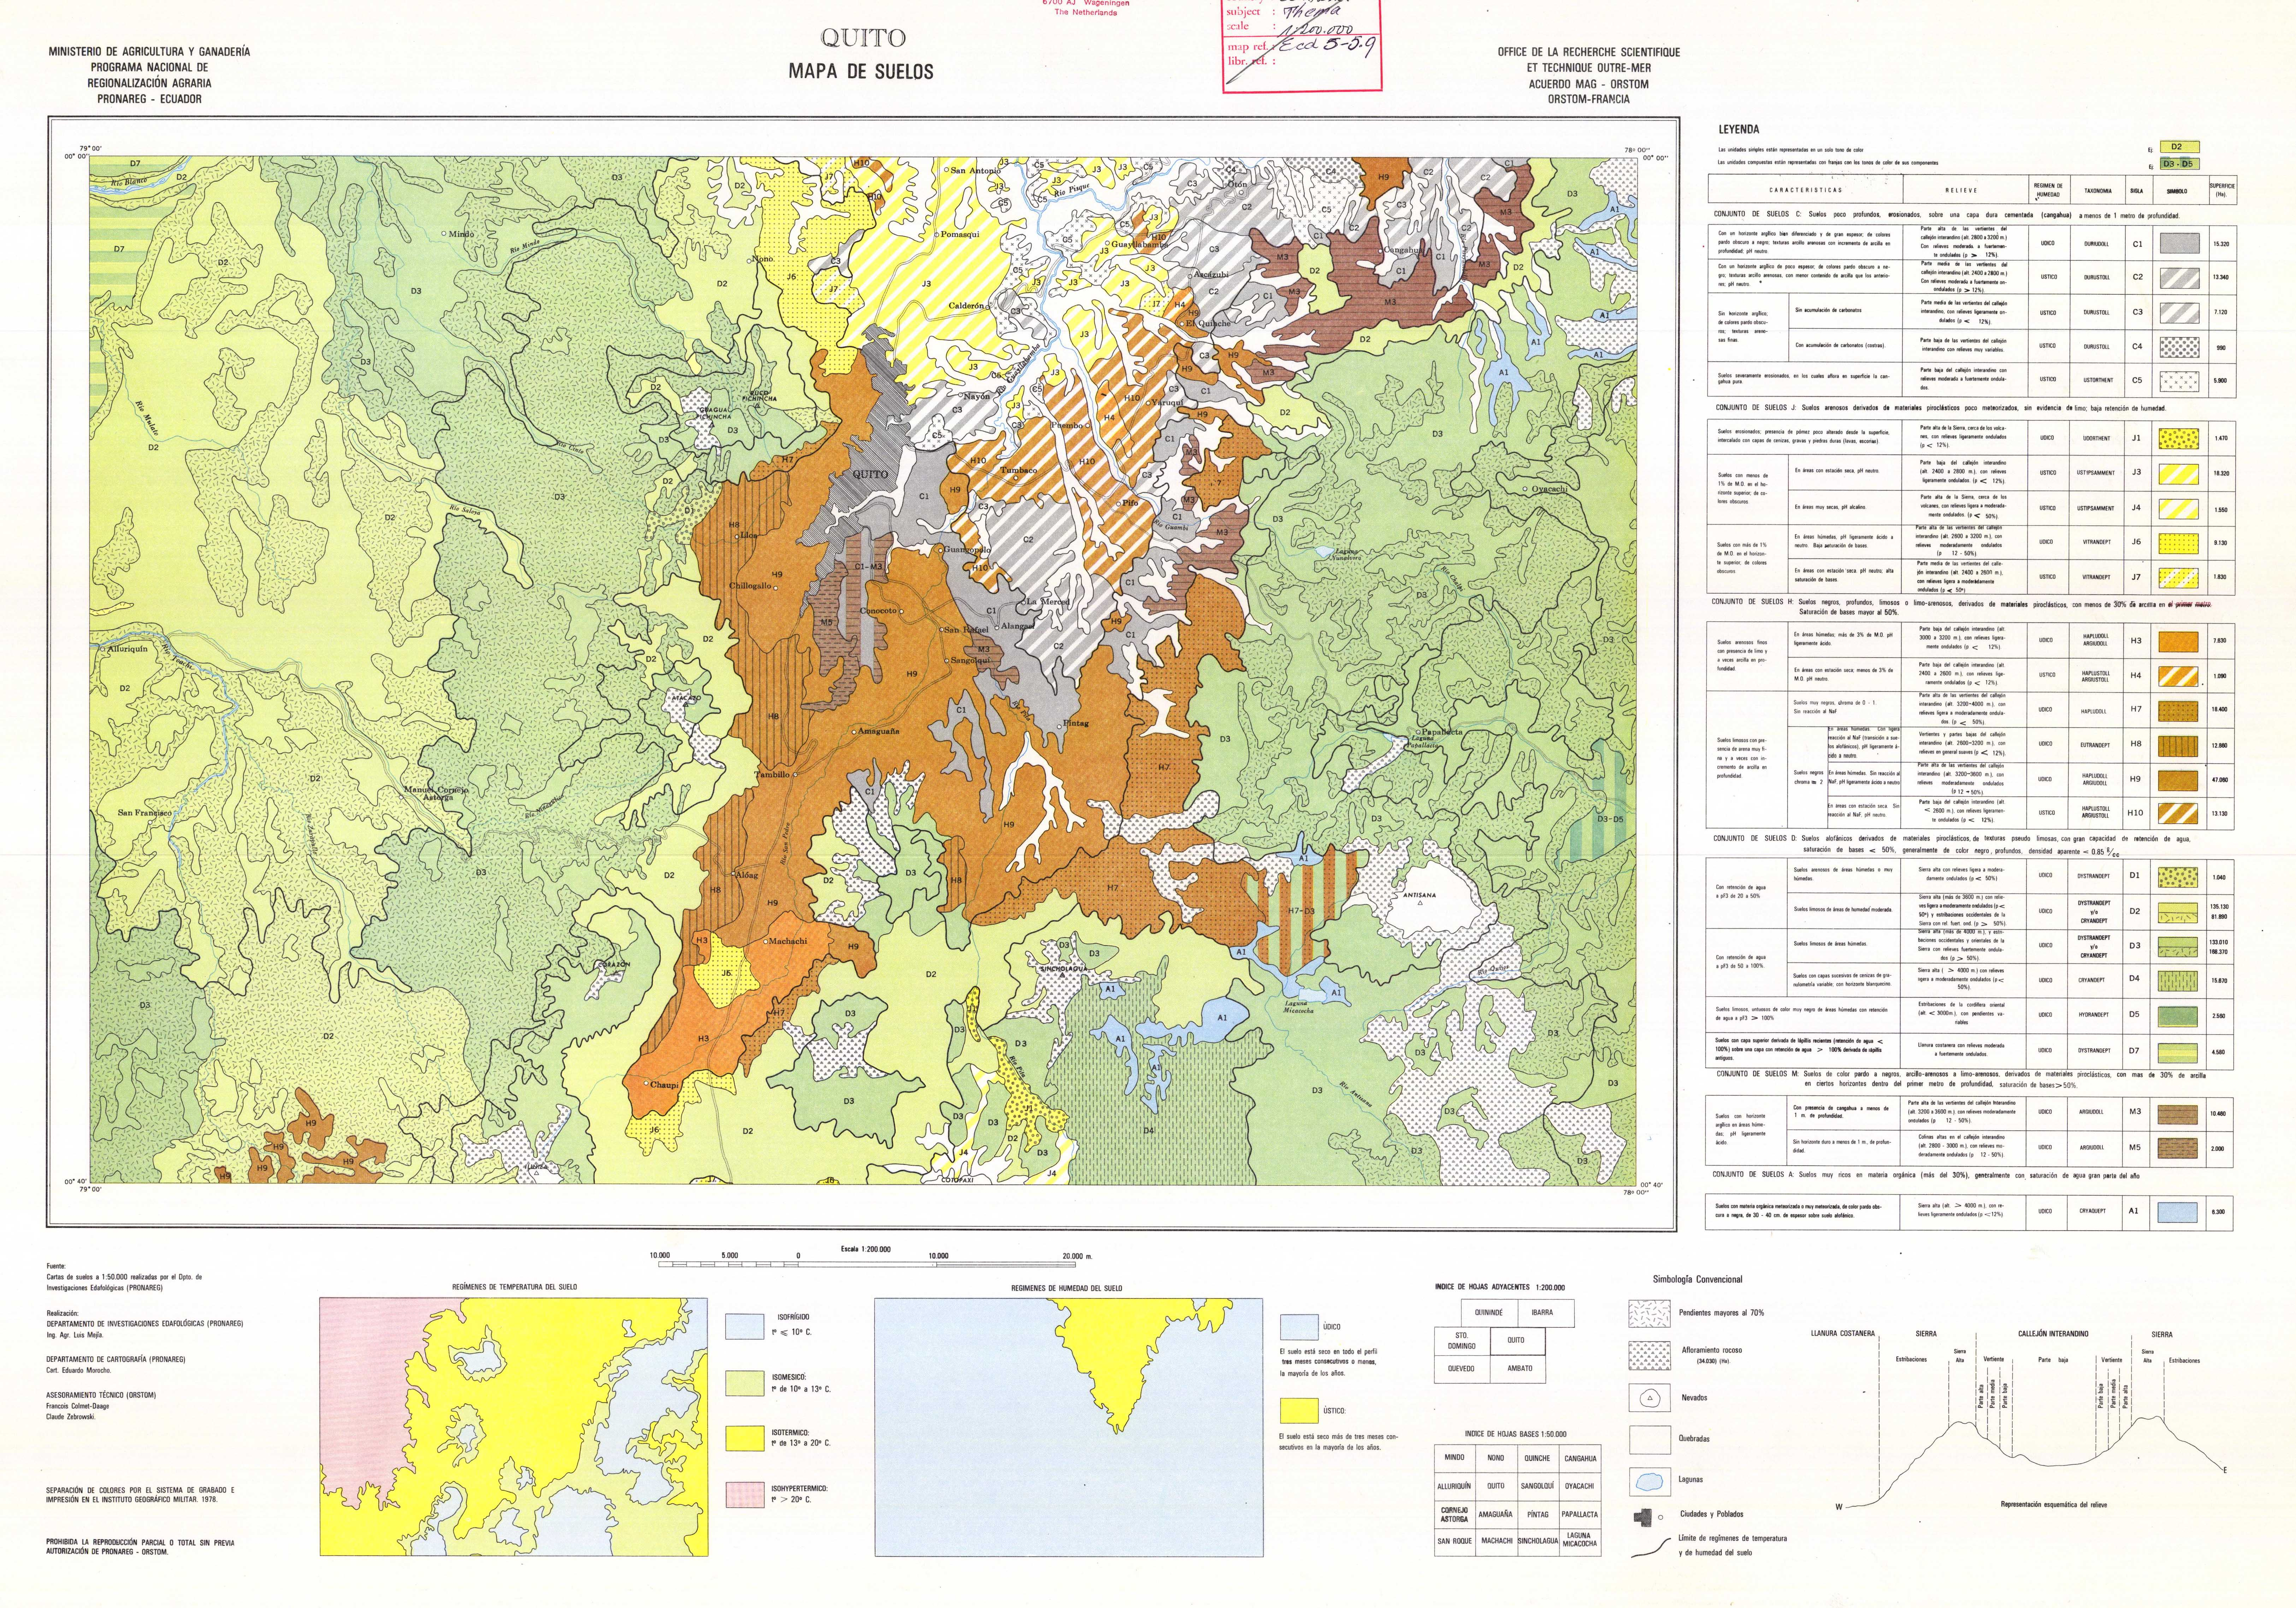 Mapa de Suelos. Quito. [Soil map] - ESDAC - European Commission Quito Map on